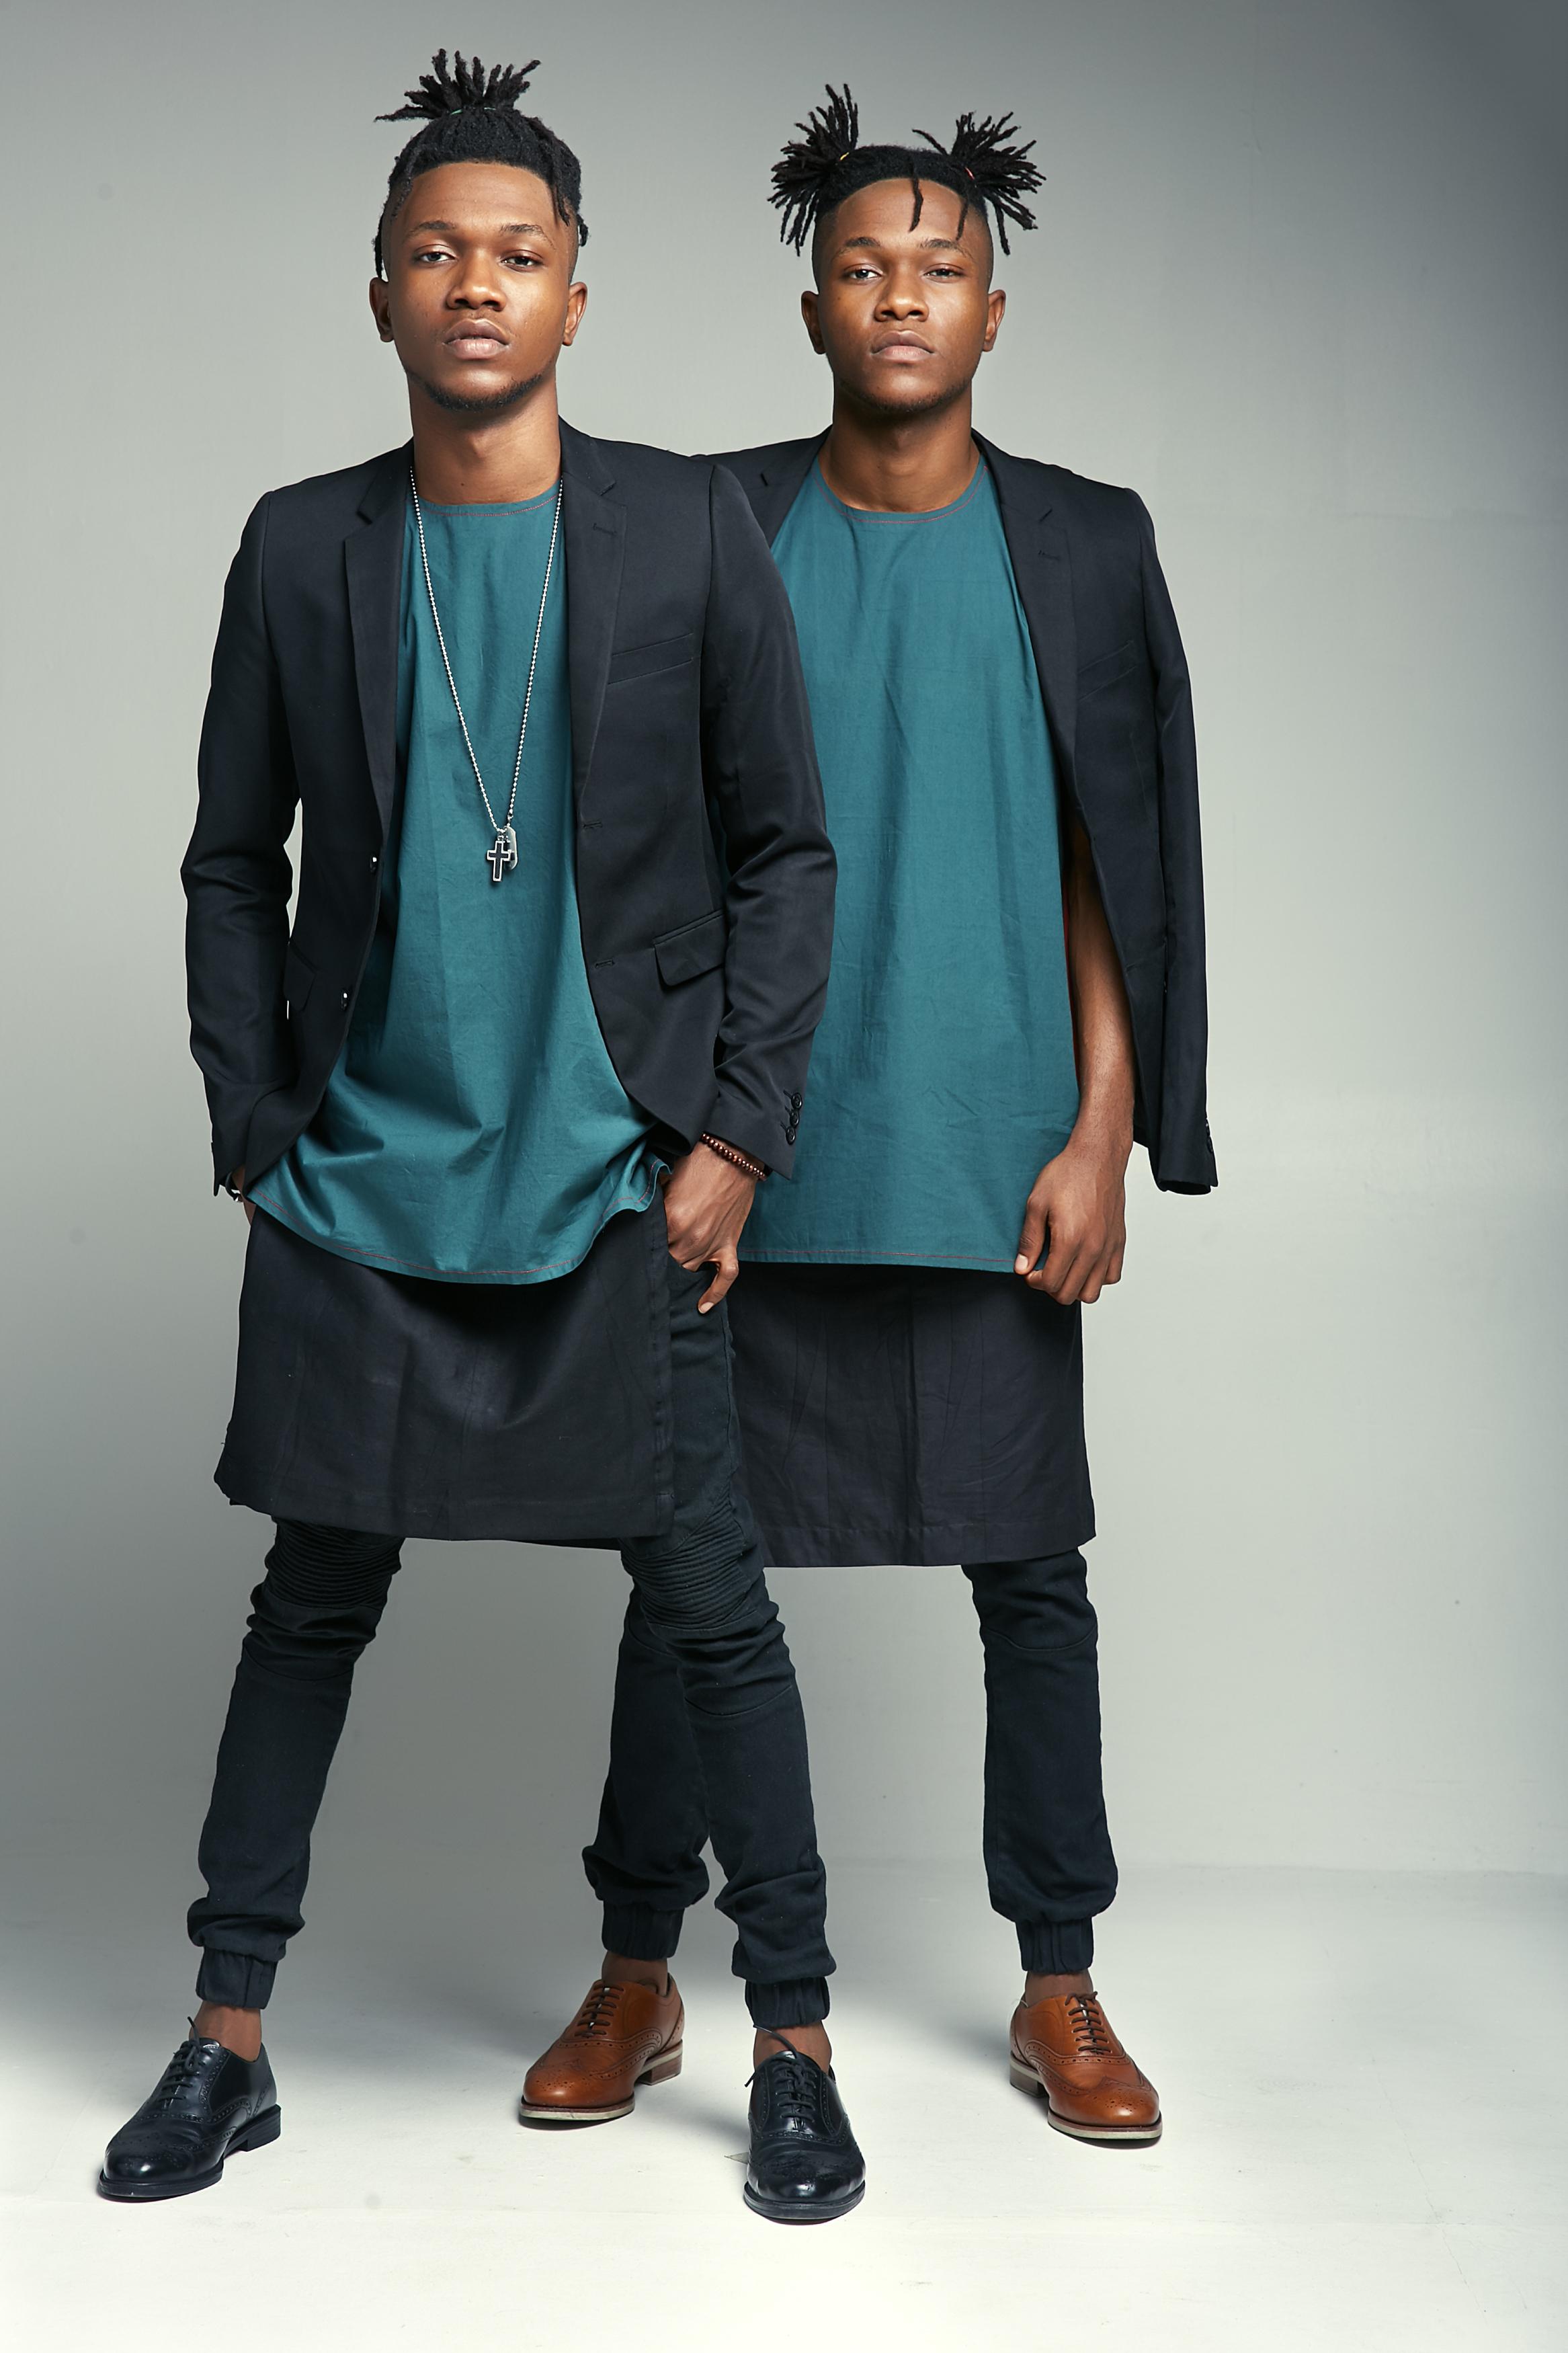 Nigerian celebrities twins